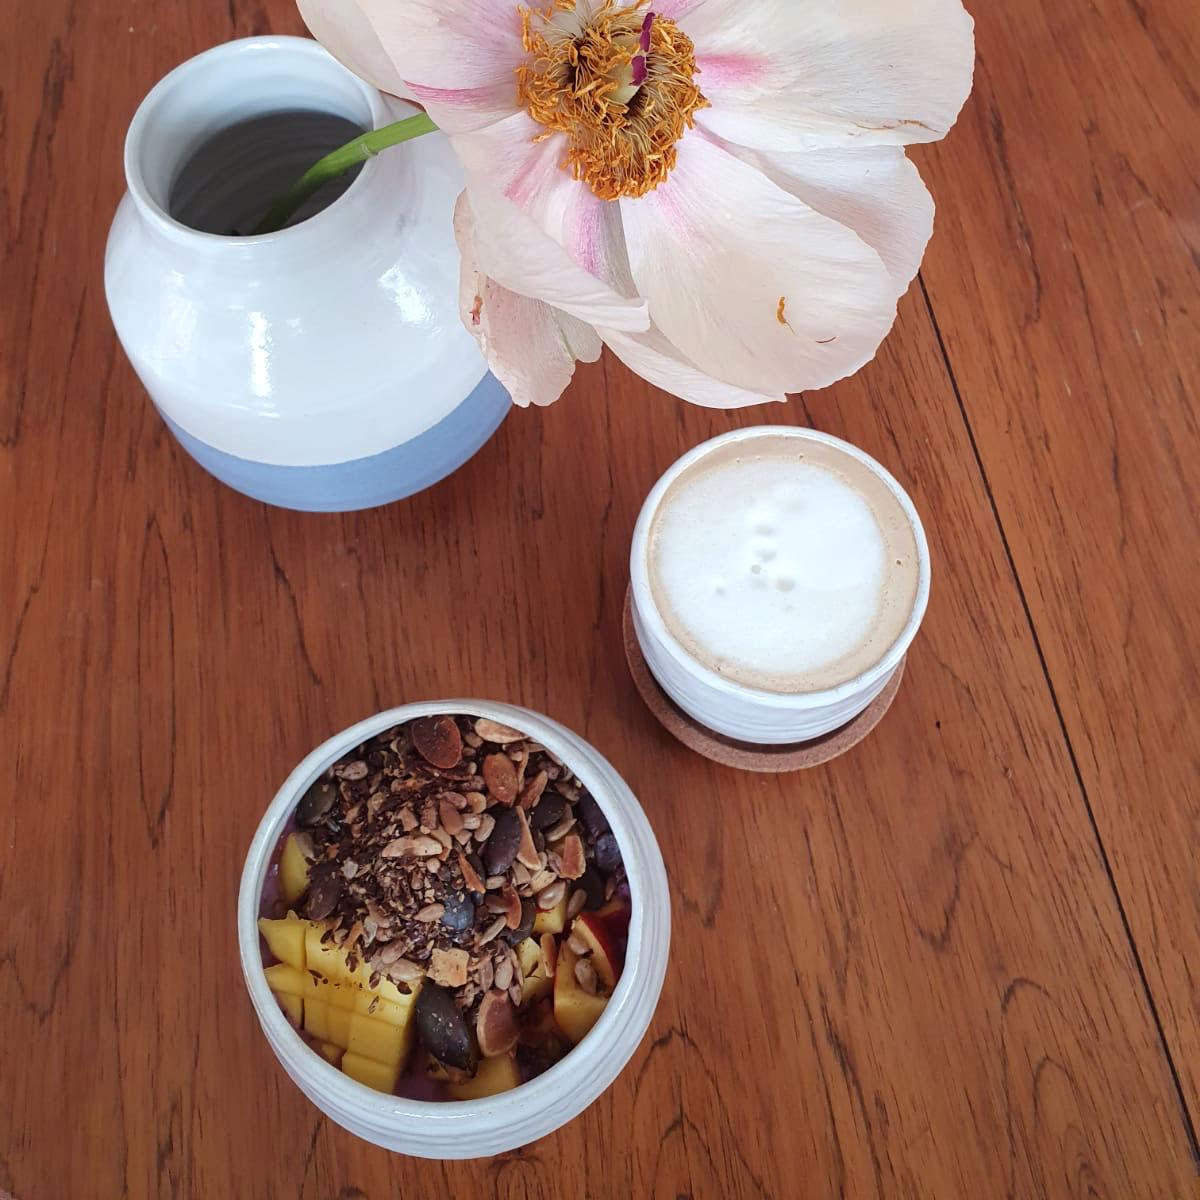 irma-heidi-keramik-muesli-tasse-vase-impressionen